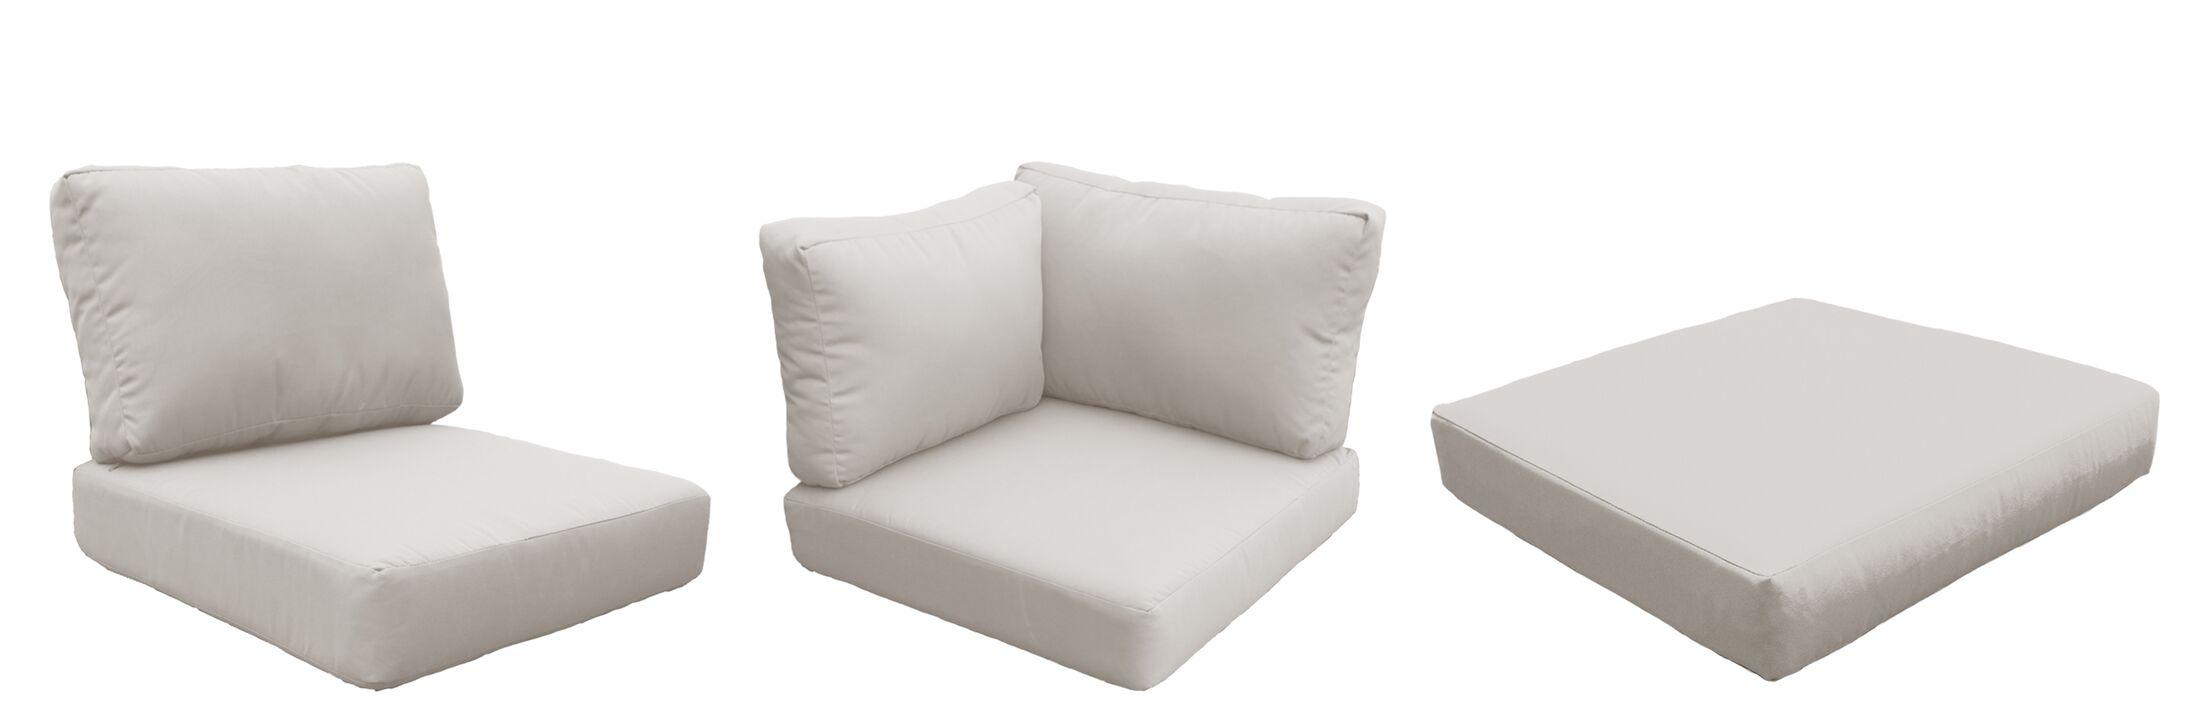 Barbados 12 Piece Outdoor Cushion Set Fabric: Beige